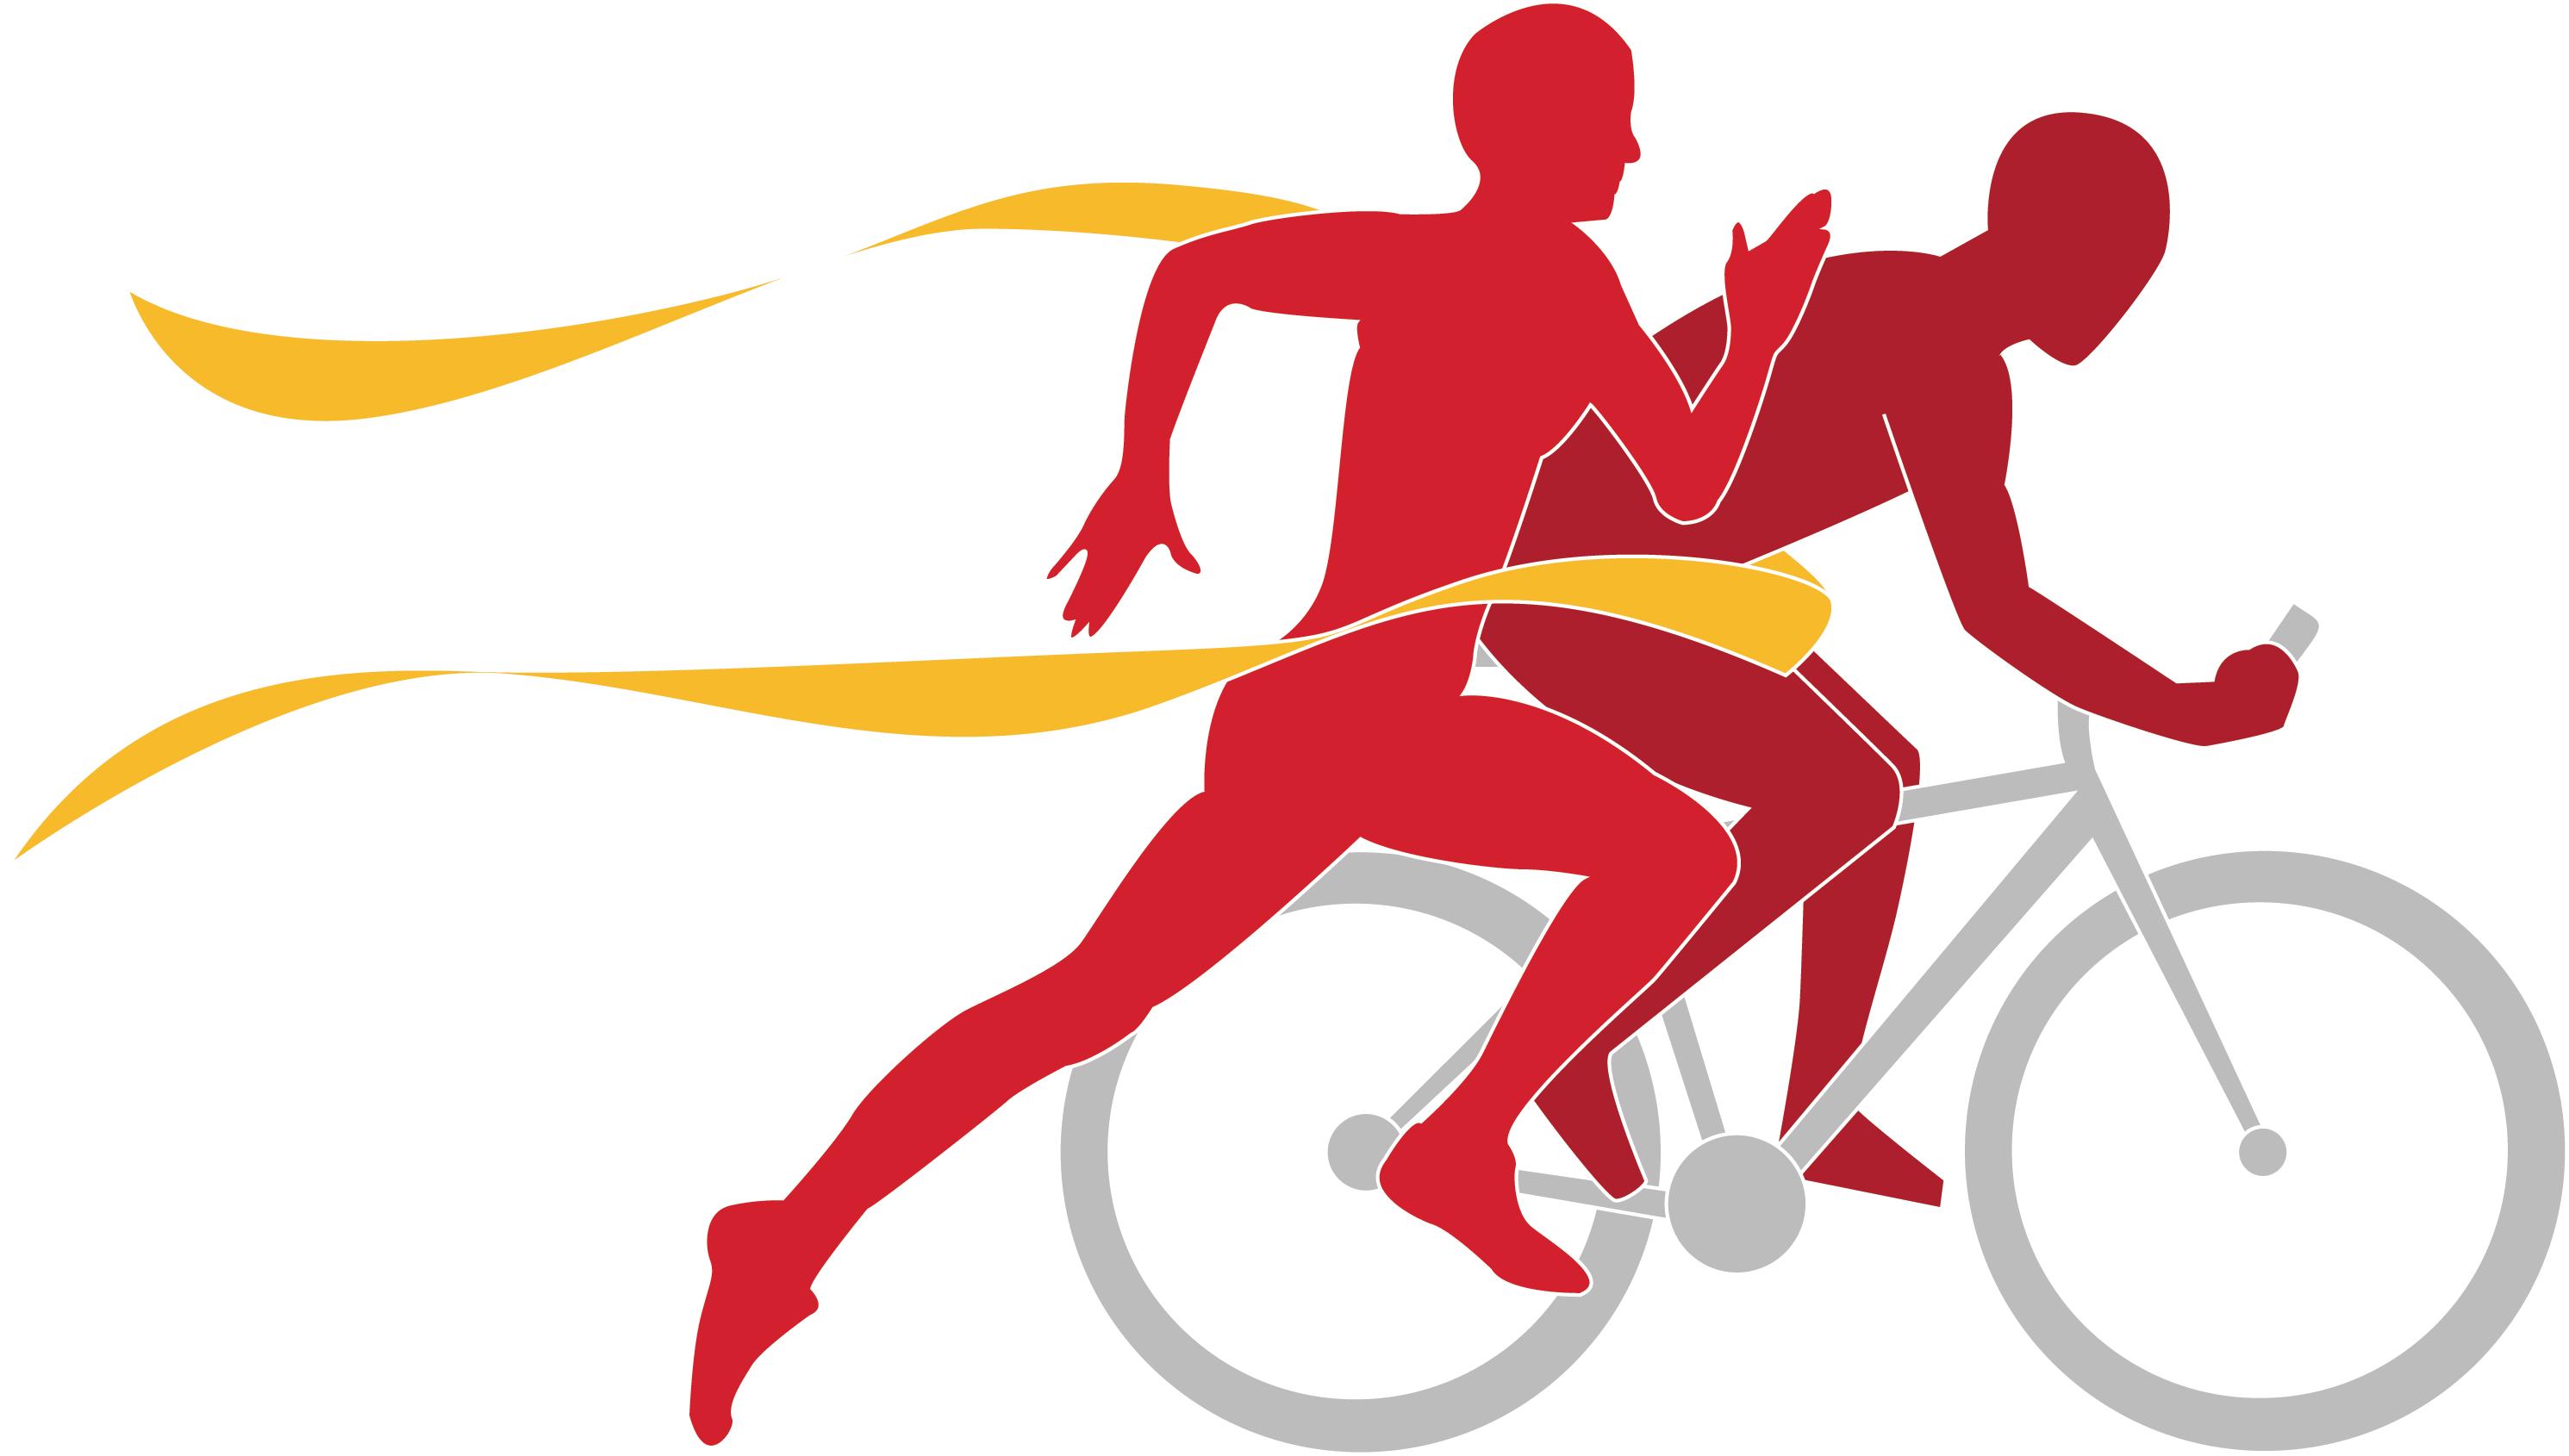 Olympics clipart marathon medal. The cambodia charity run